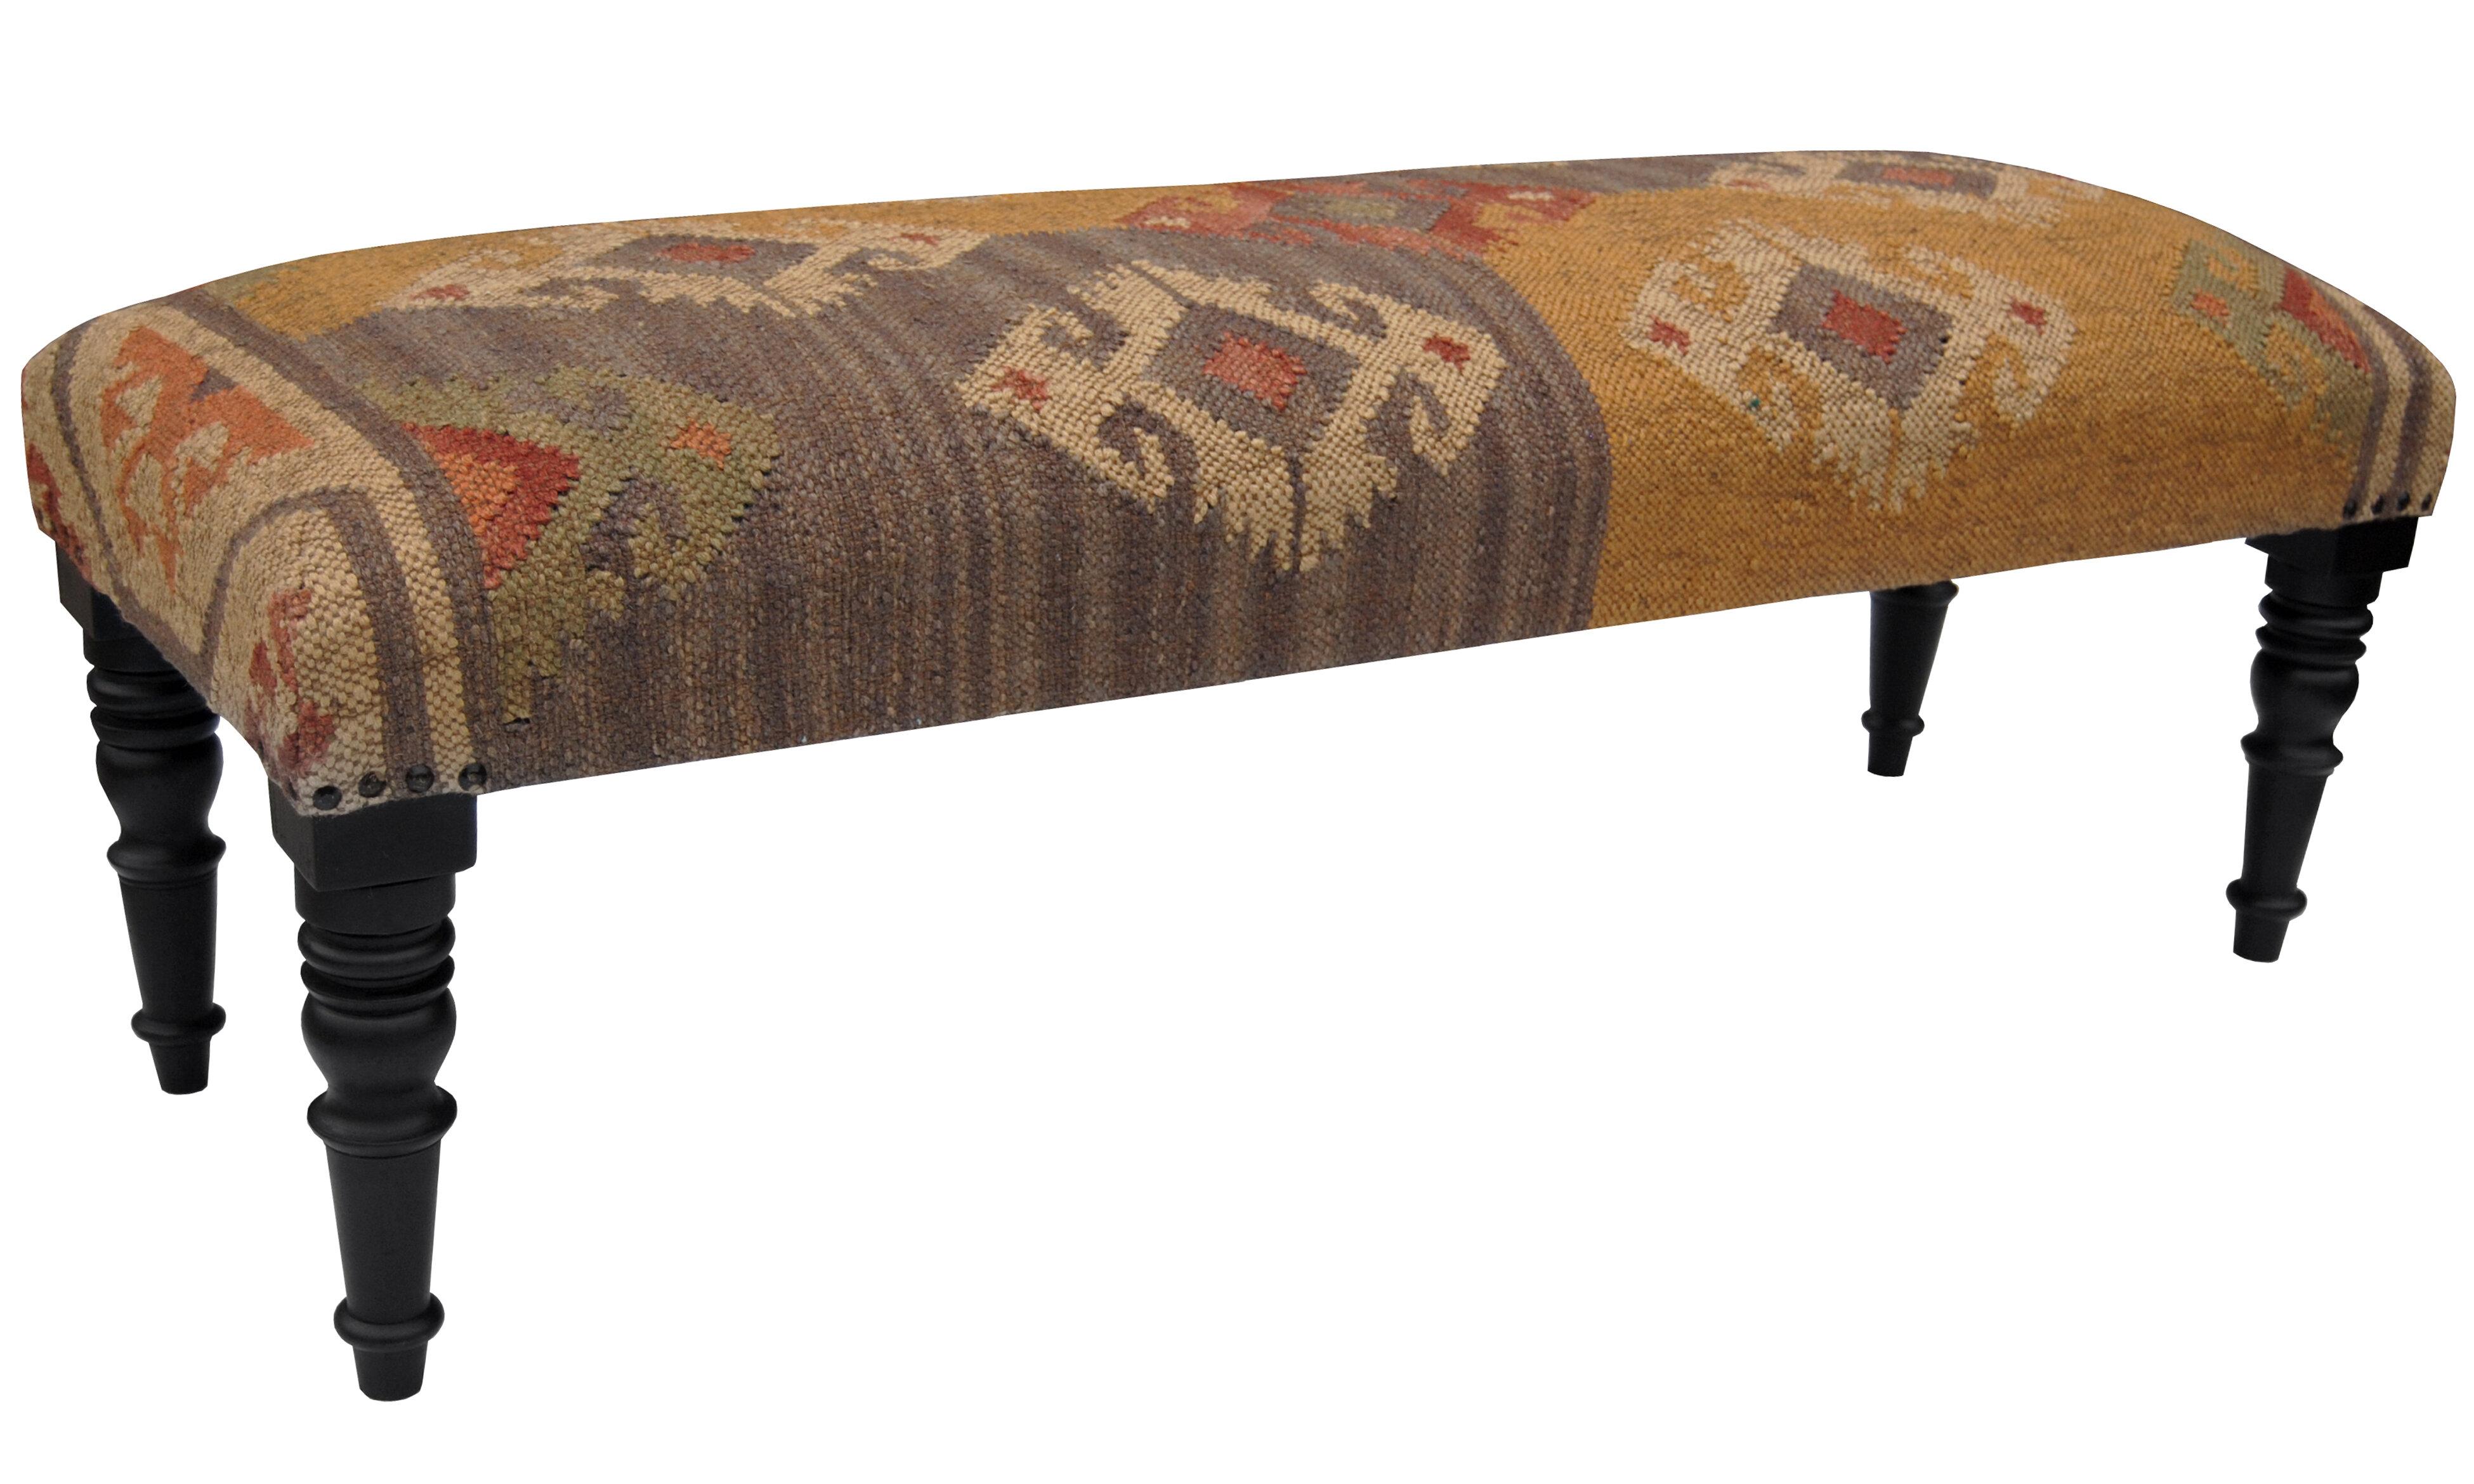 Wondrous Bryleigh Handmade Indo Kilim Wooden Bench Frankydiablos Diy Chair Ideas Frankydiabloscom